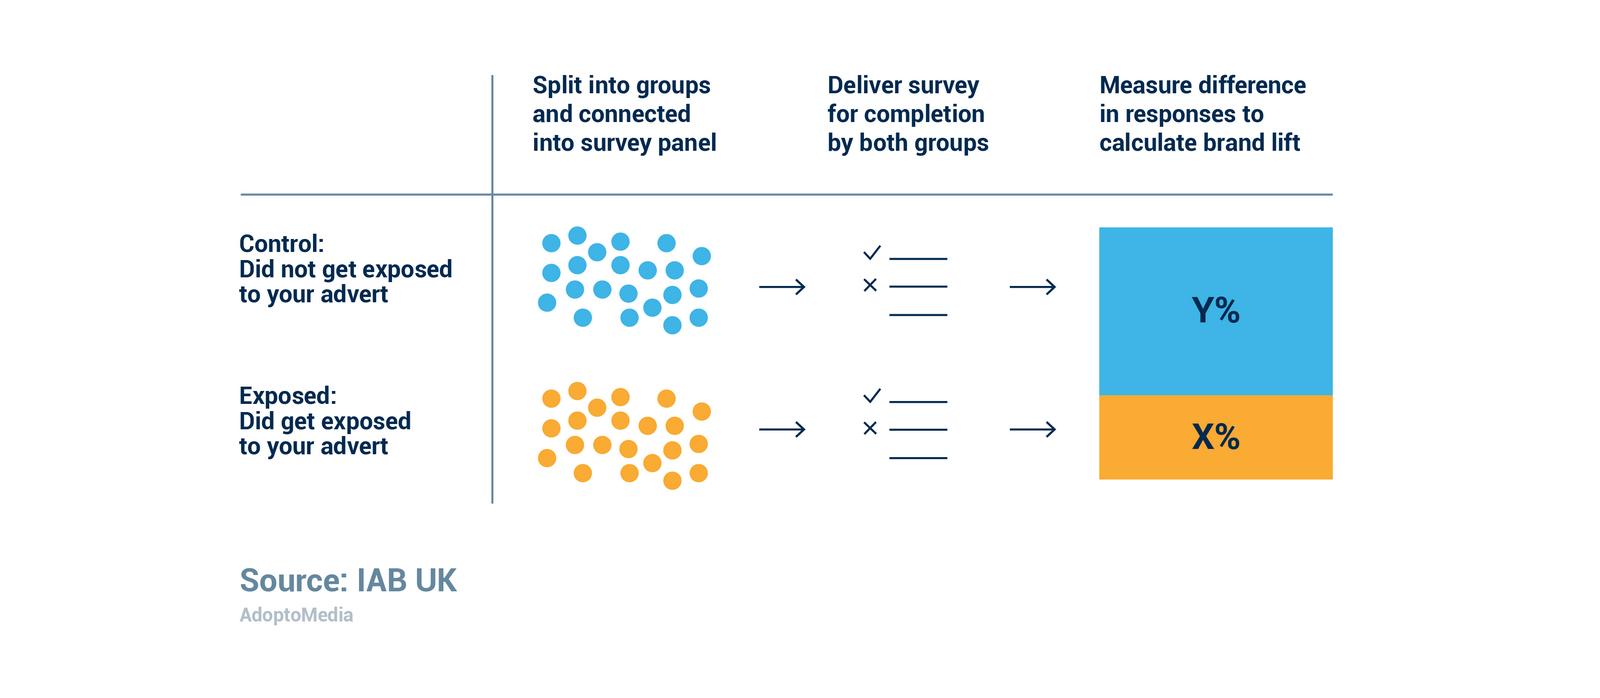 brand studies, ad effectiveness, cross-media measurement, cross-platform measurement